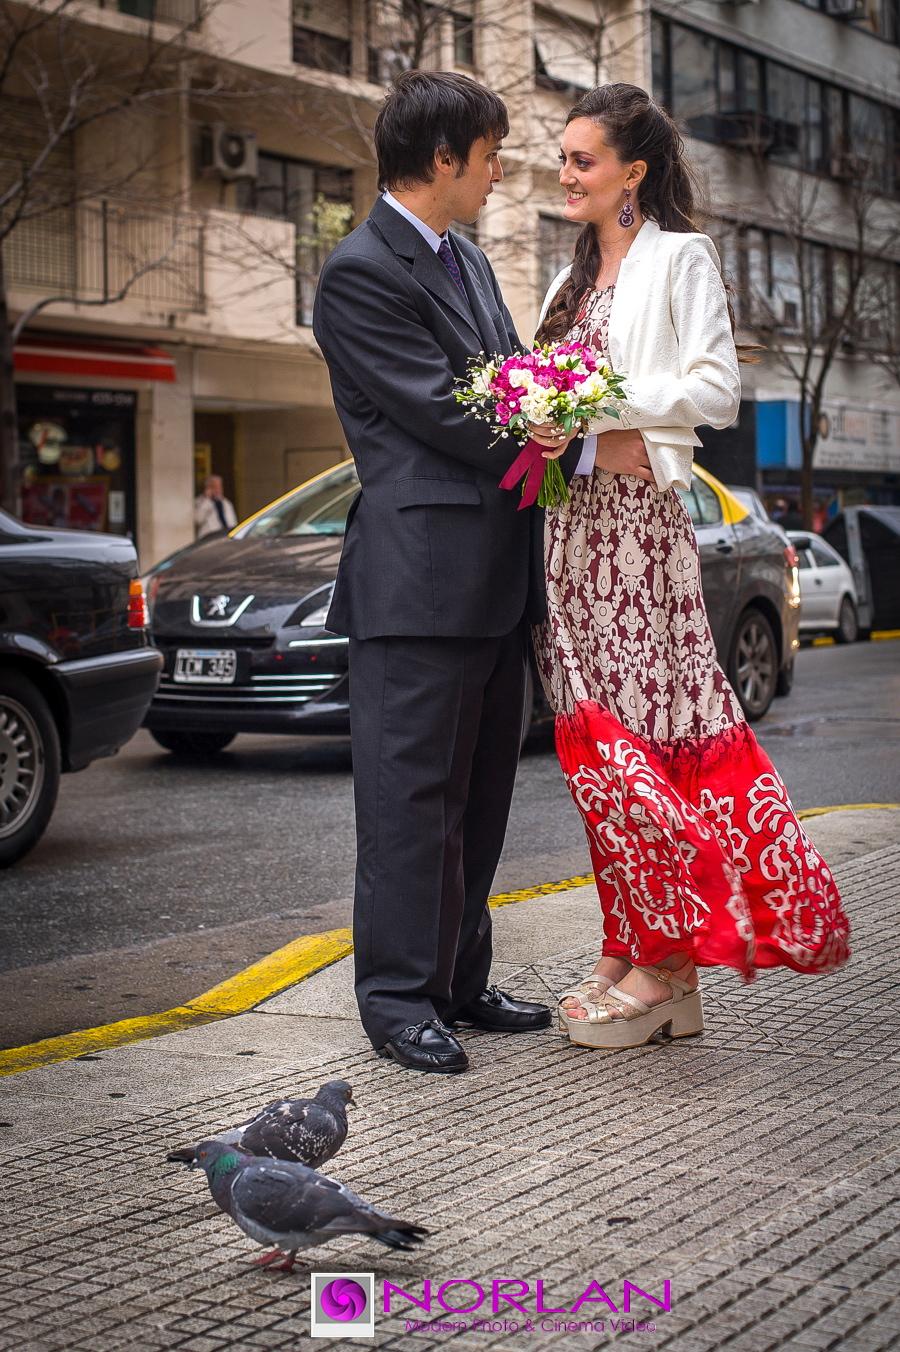 Fotos bodas-casamientos norlan-fotos de bodas en bs as- fotos de norlan estudio-fotos de moderm photo y cinema video-fotografias de bodas -fotos de novias_07